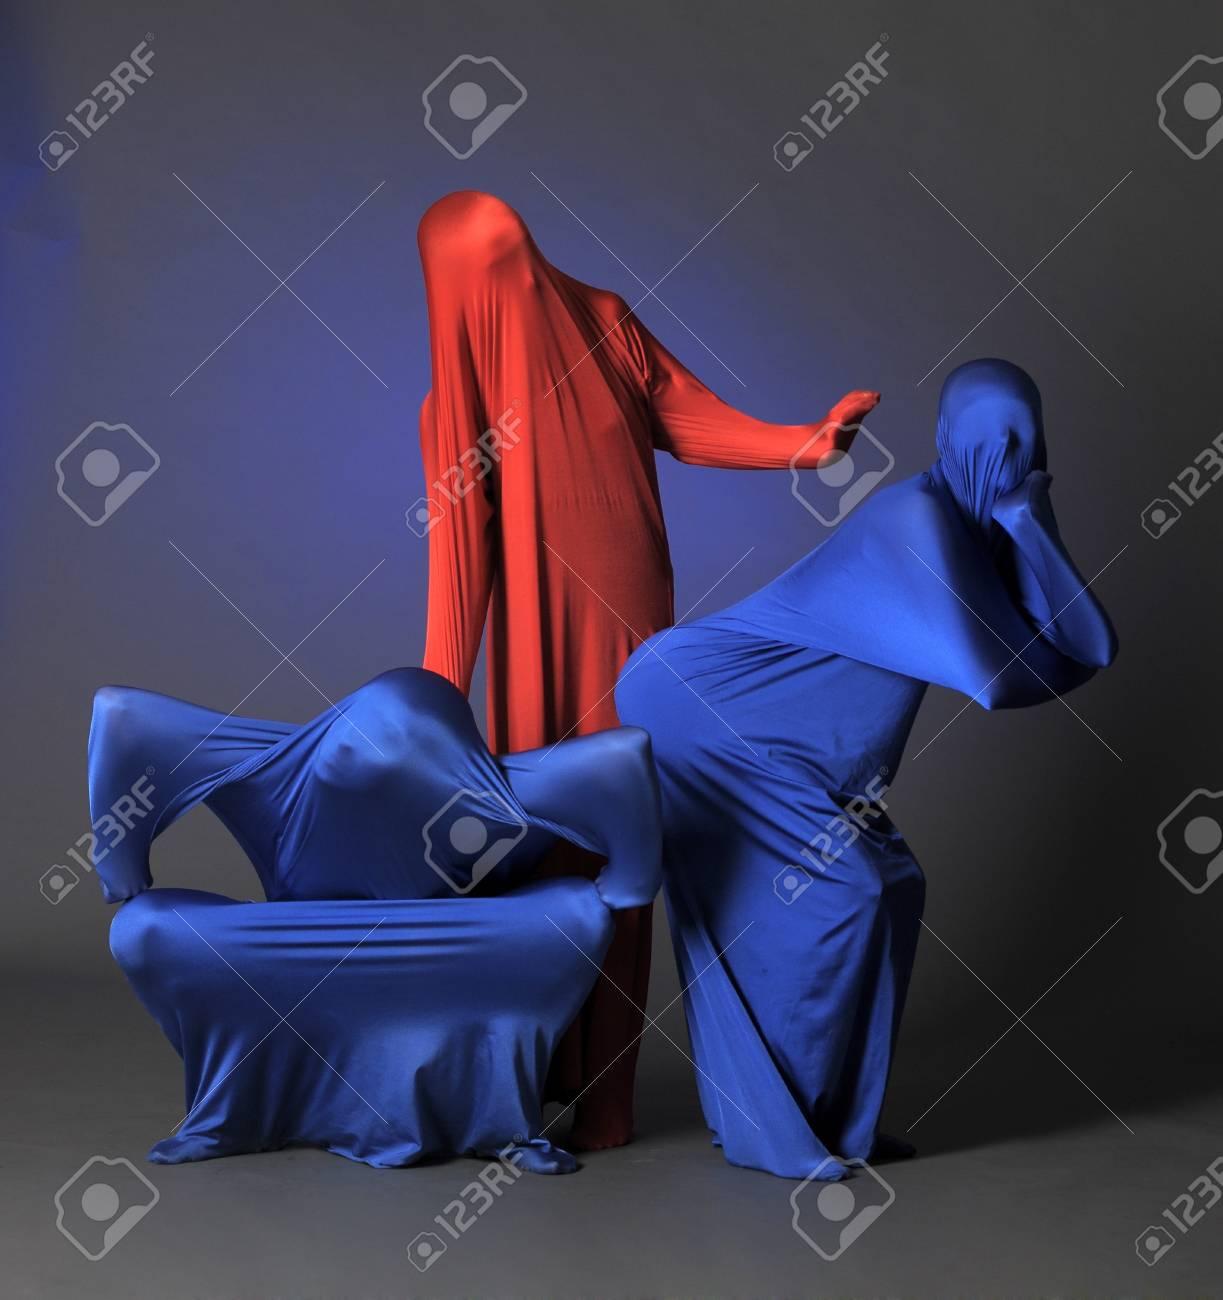 three abstract human figures Stock Photo - 13342824